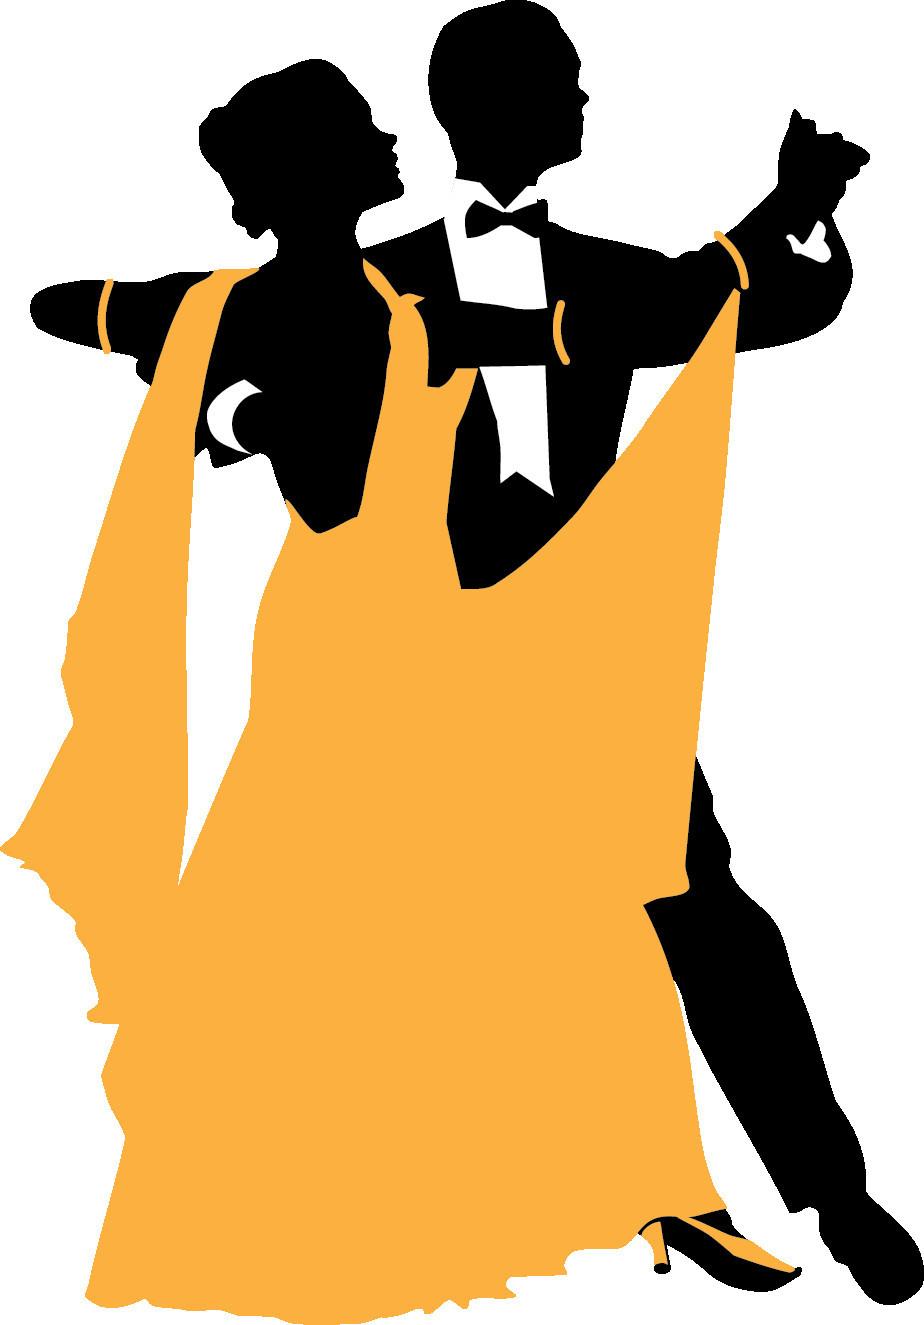 924x1325 Swing Dancing Silhouette Learnfree Me Tearing Dance Silhouettes